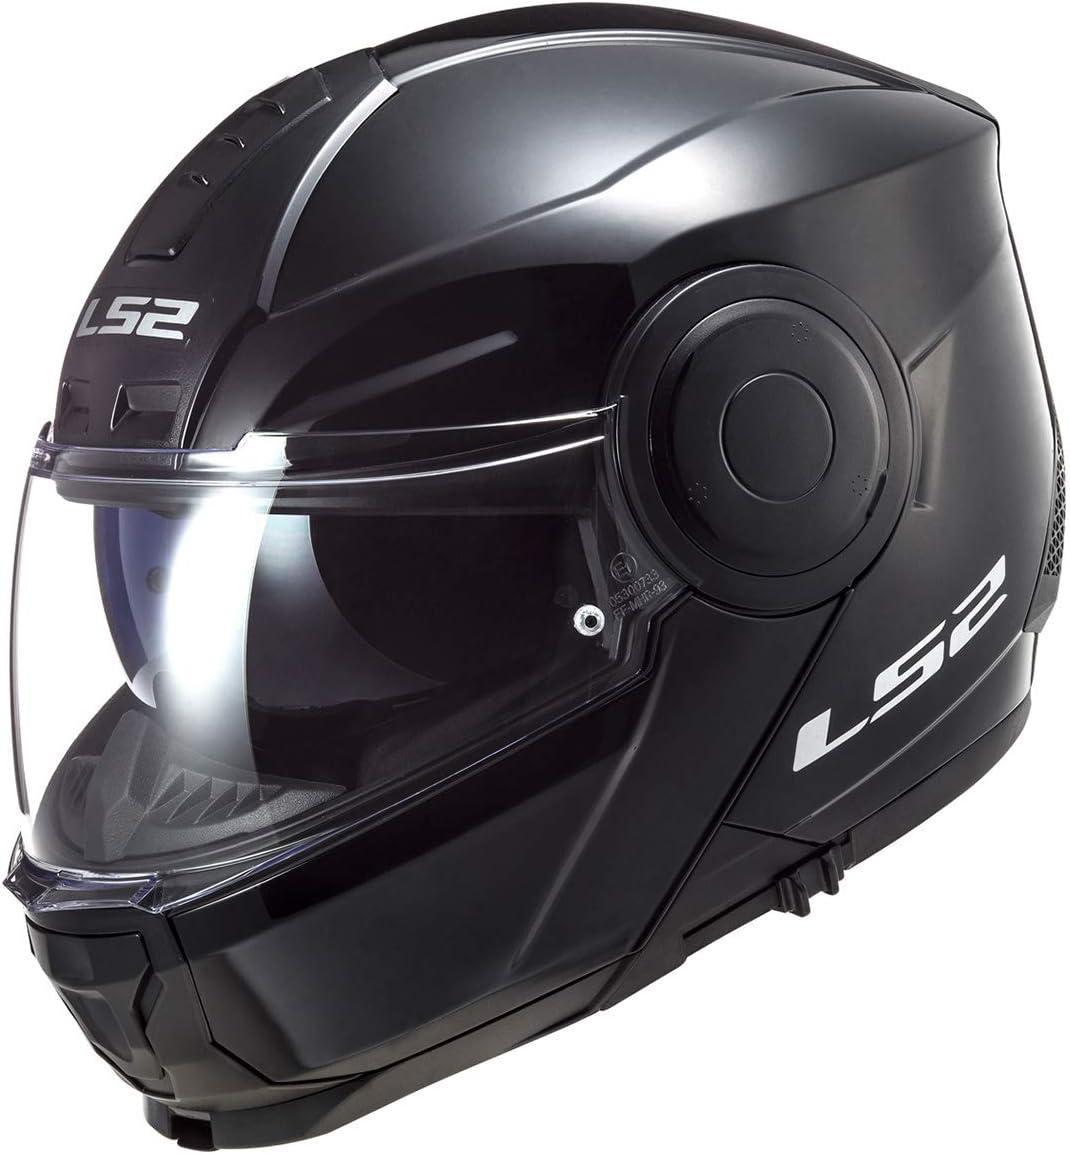 LS2 Helmets Horizon Modular Helmet security W La - Opening large release sale Black SunShield Gloss